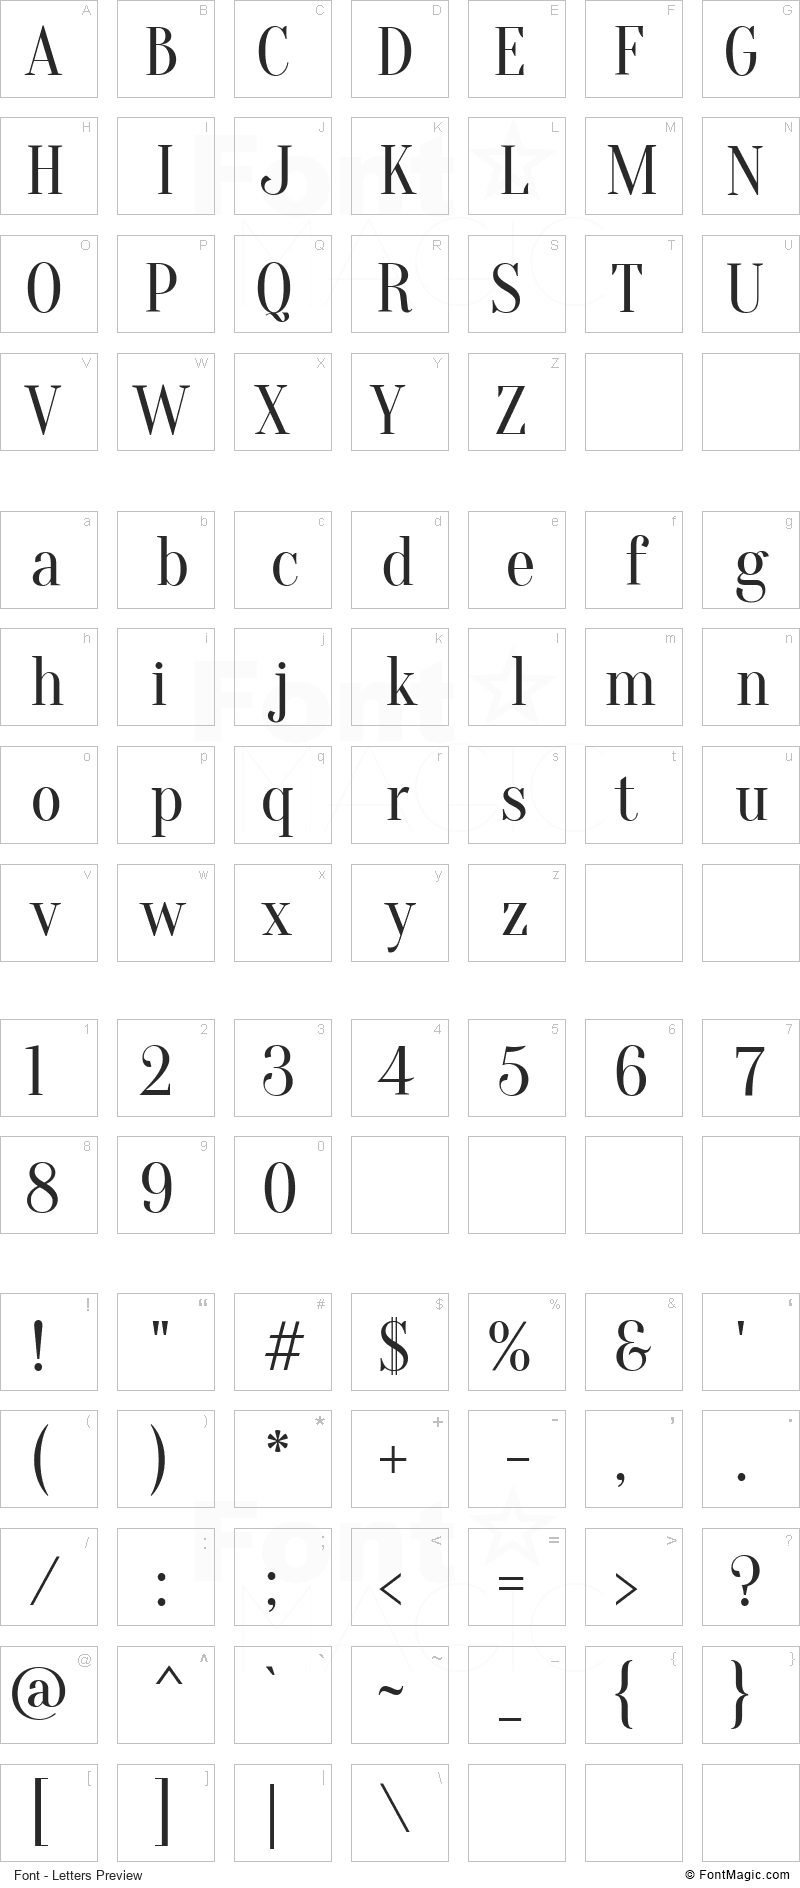 Oranienbaum Font - All Latters Preview Chart